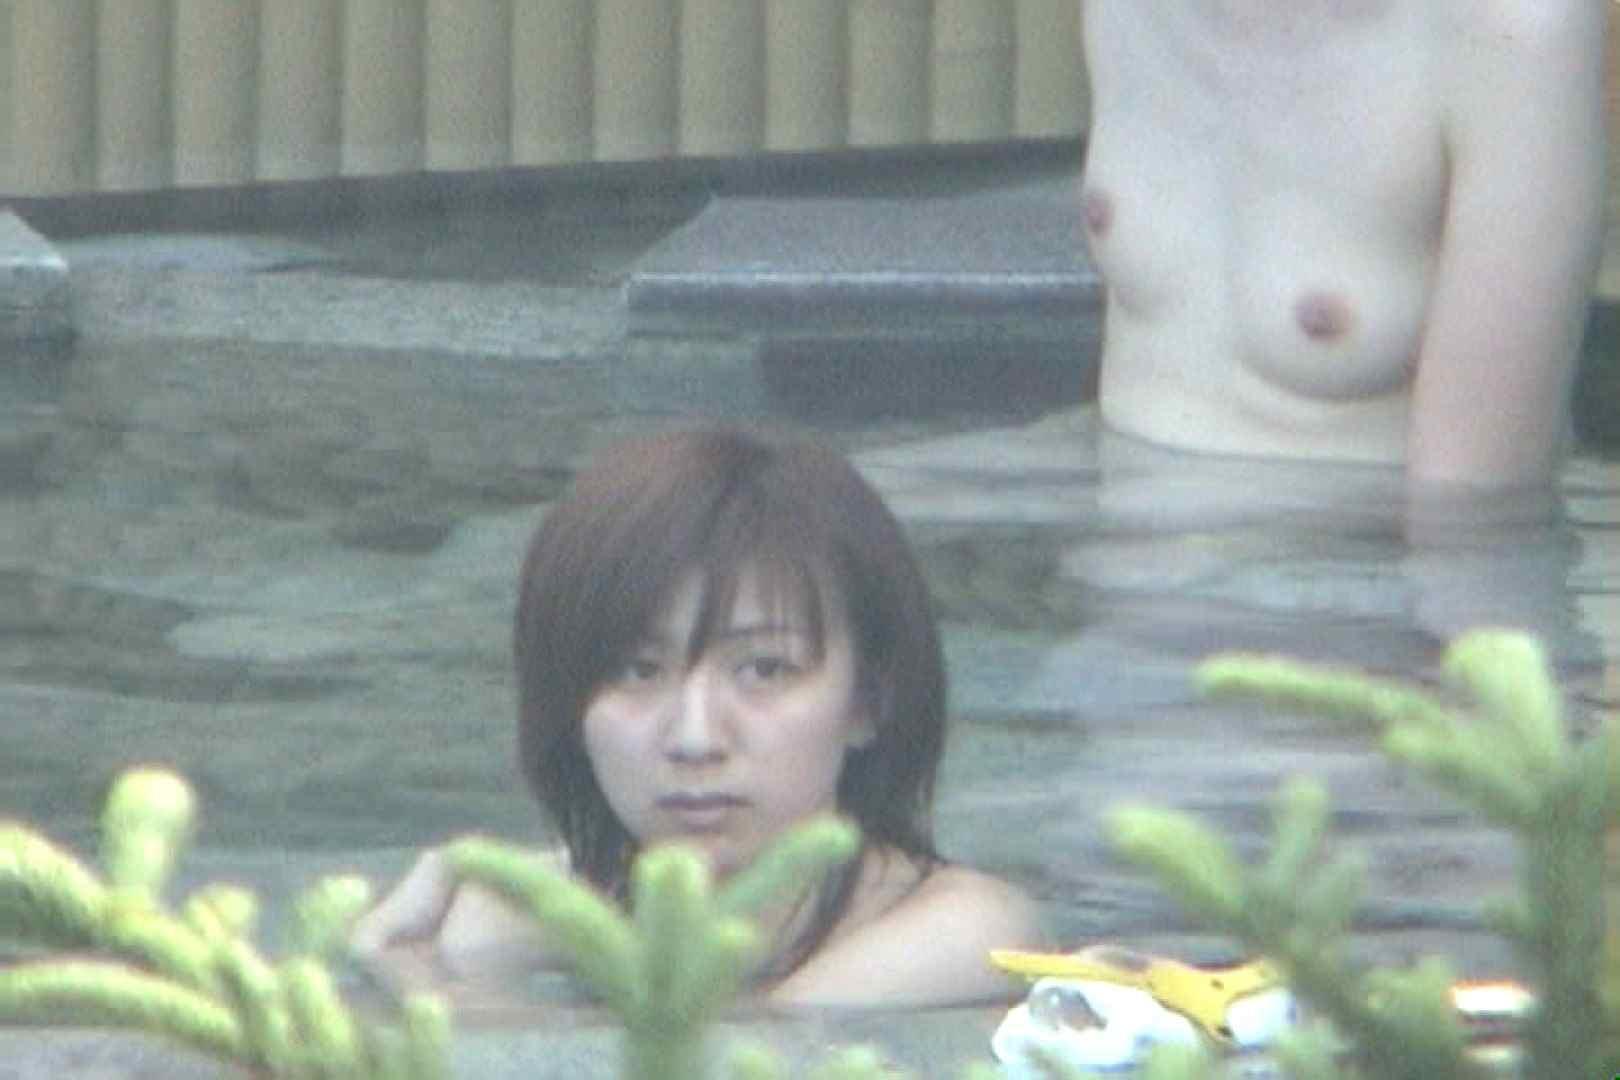 Aquaな露天風呂Vol.77【VIP限定】 露天風呂編  100PIX 72